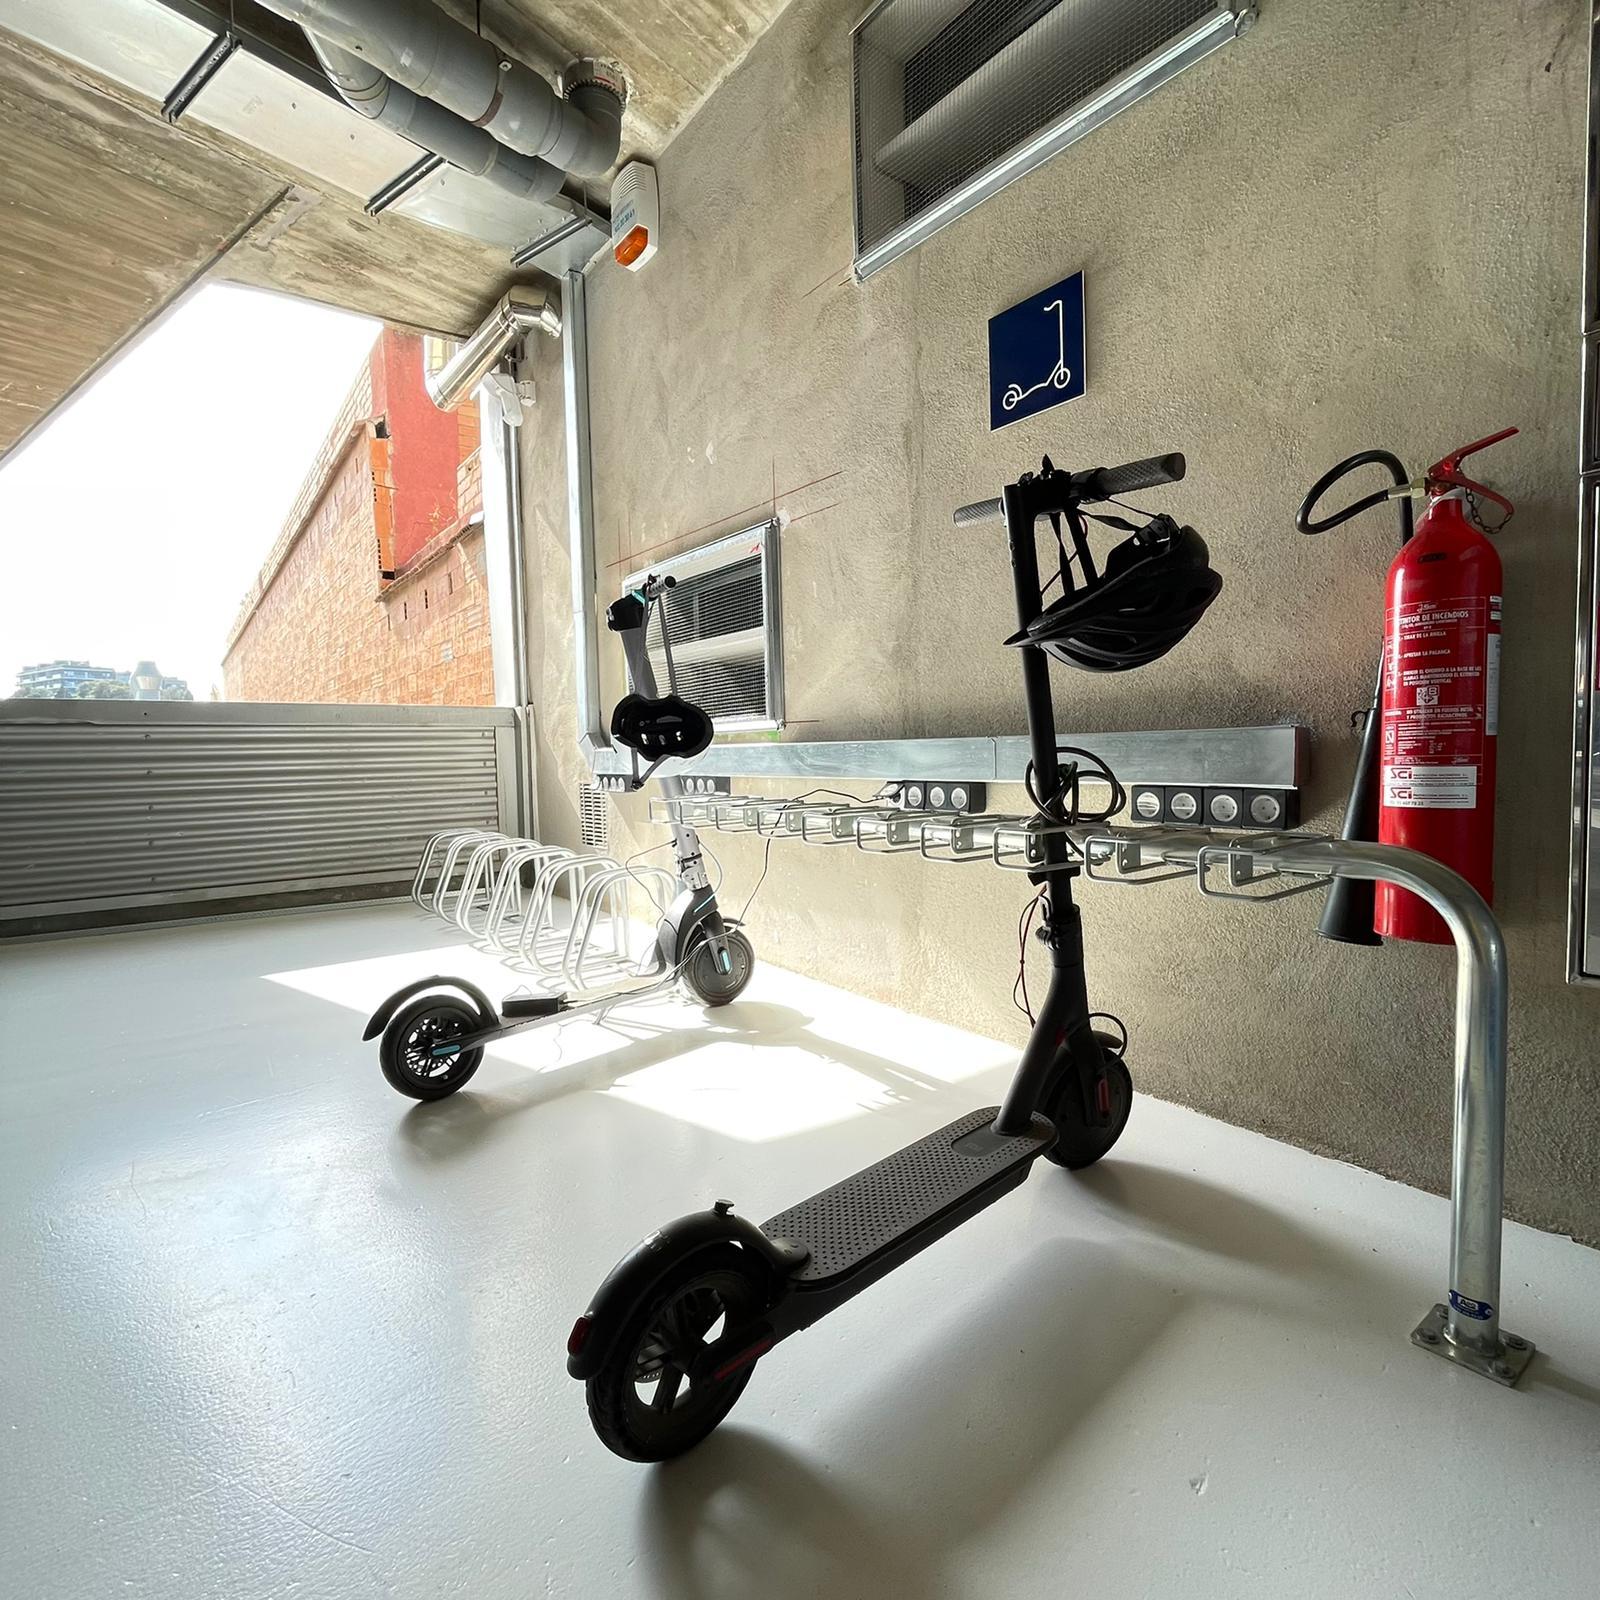 Roller scooter rack